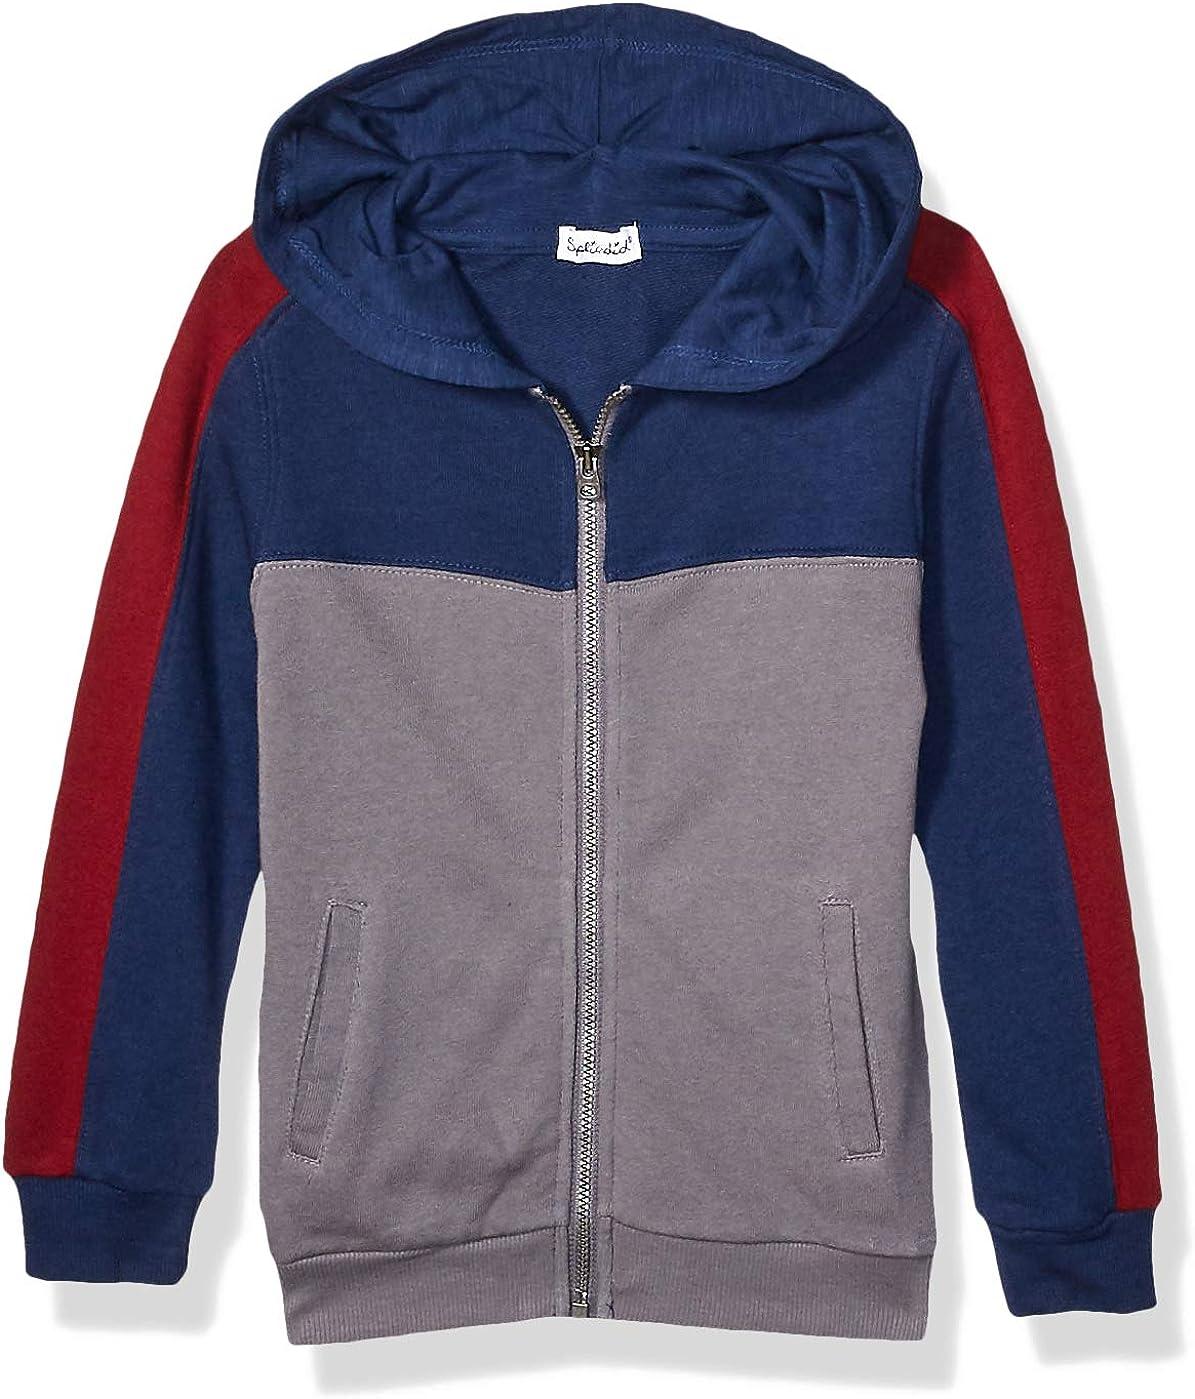 Splendid Boys' Little Hoodie Jacket